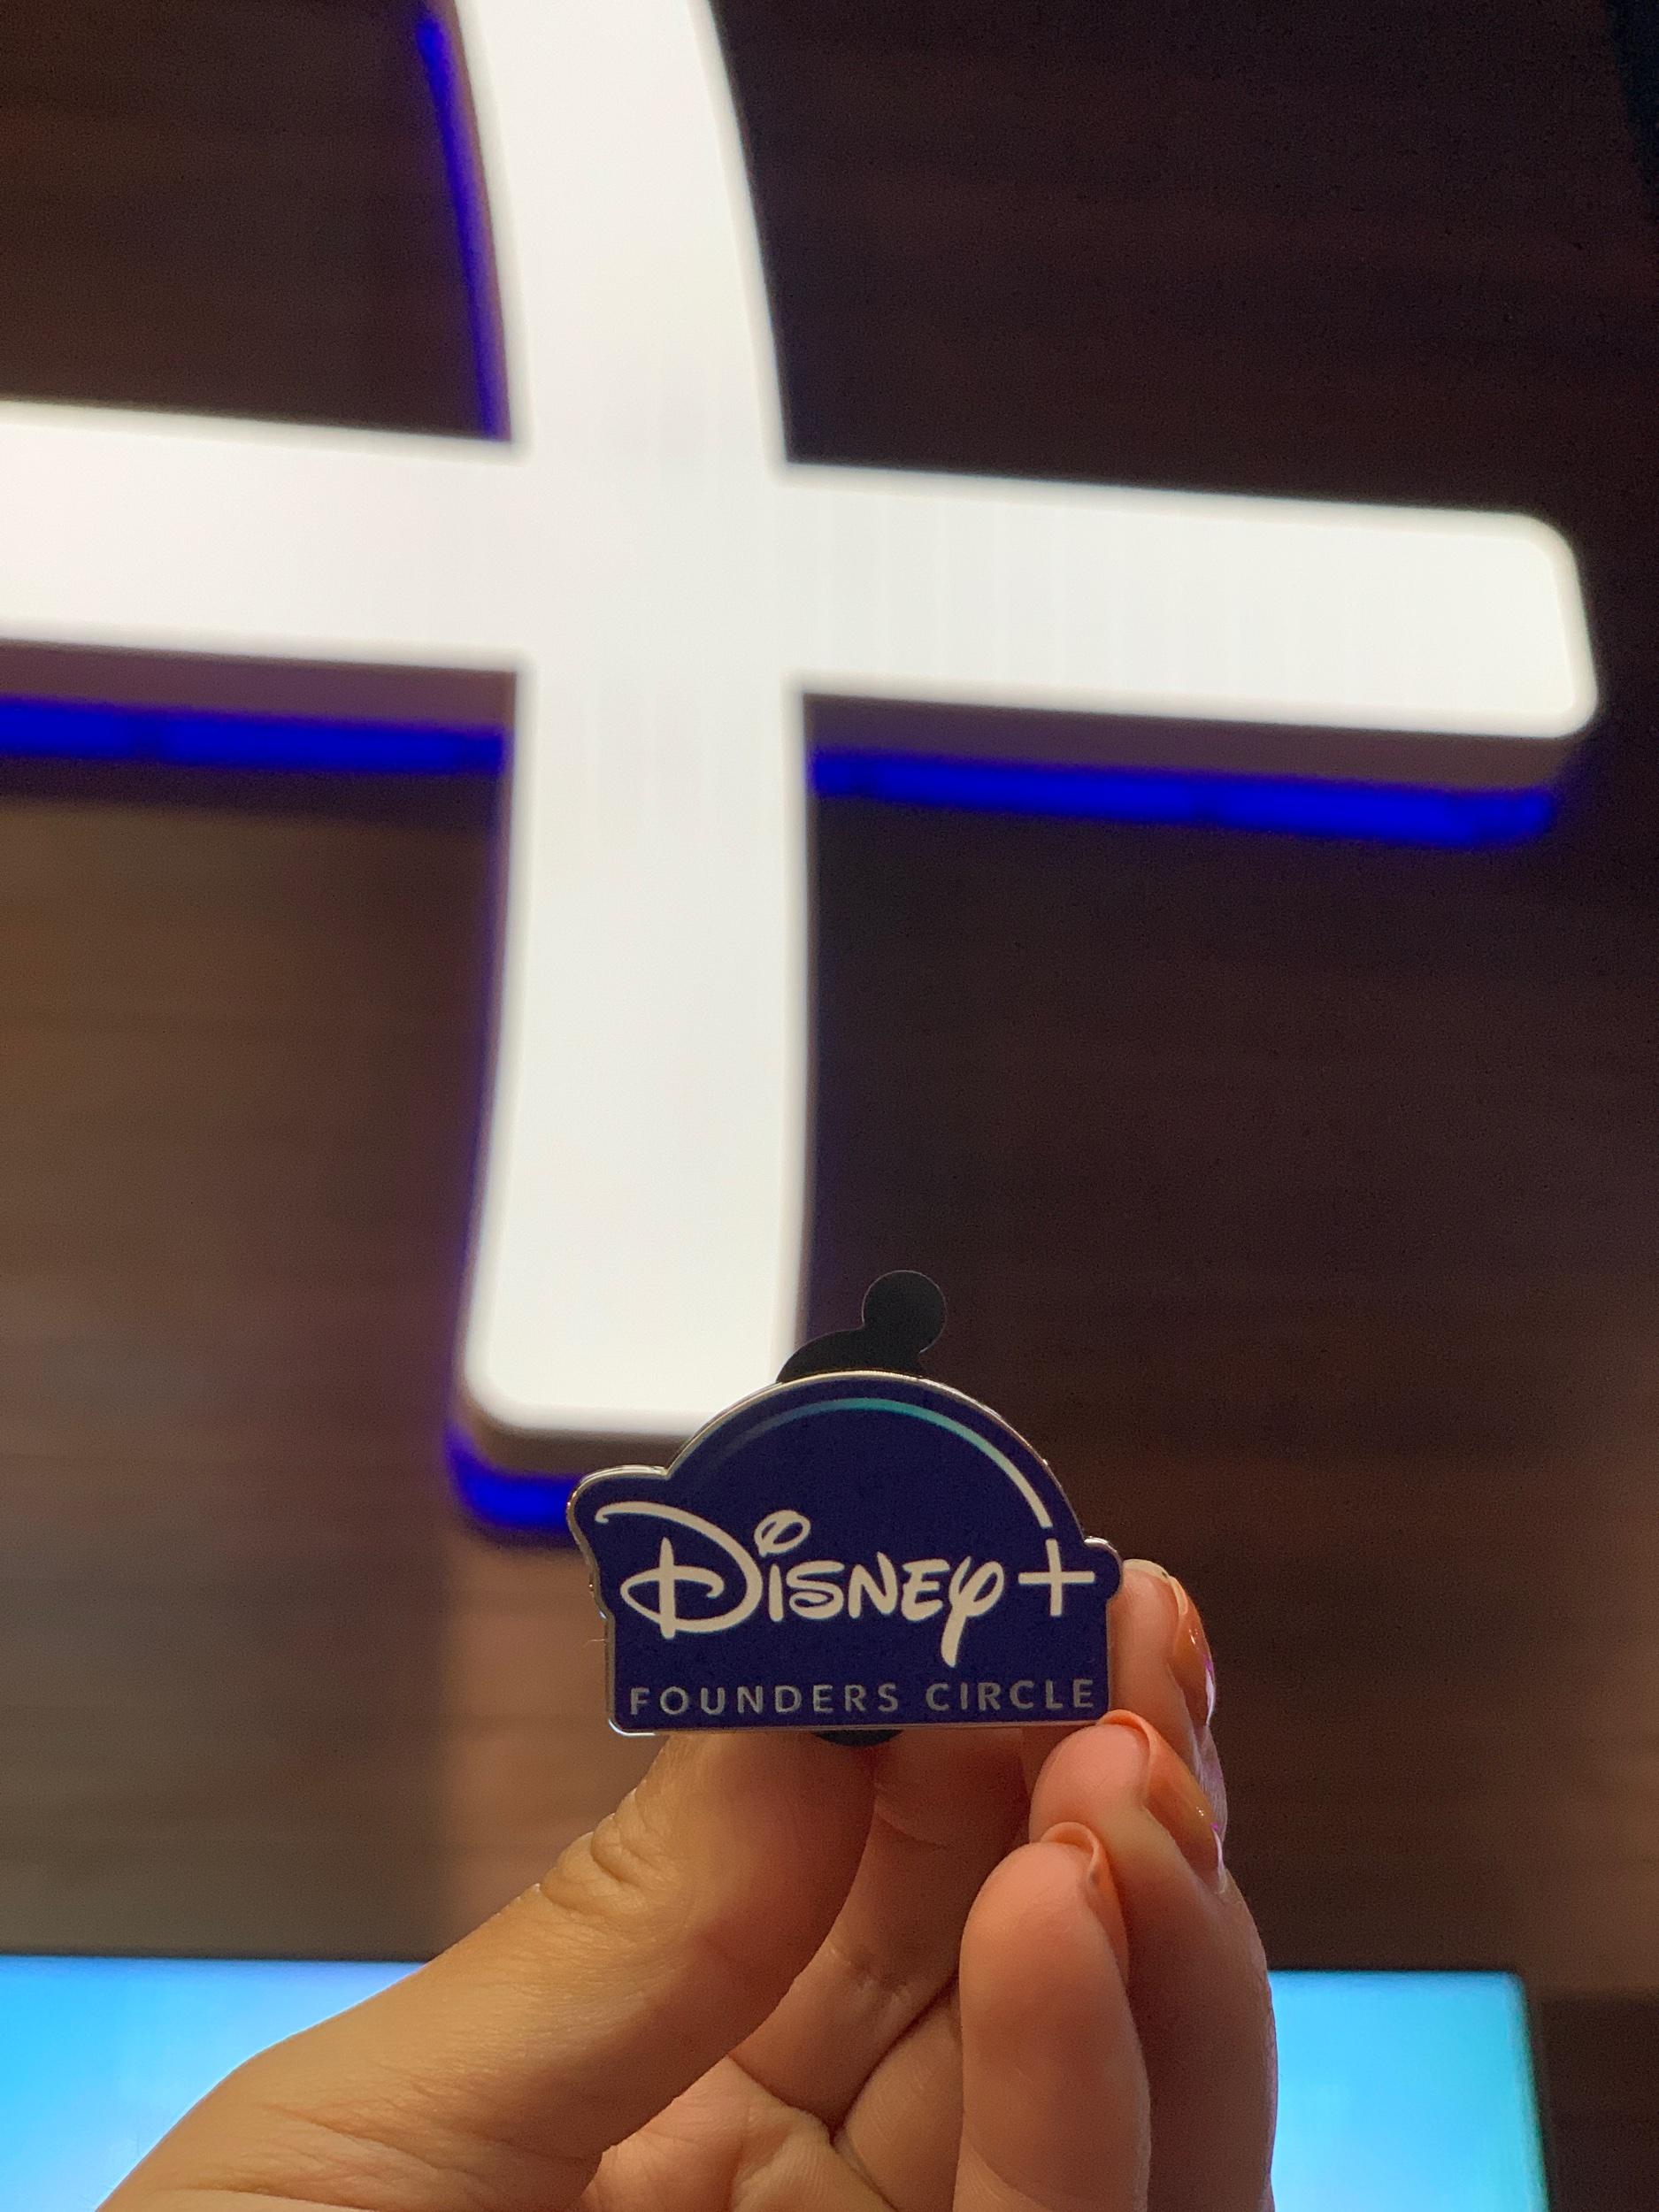 Disney+ Founders Circle Pin for signing up at D23